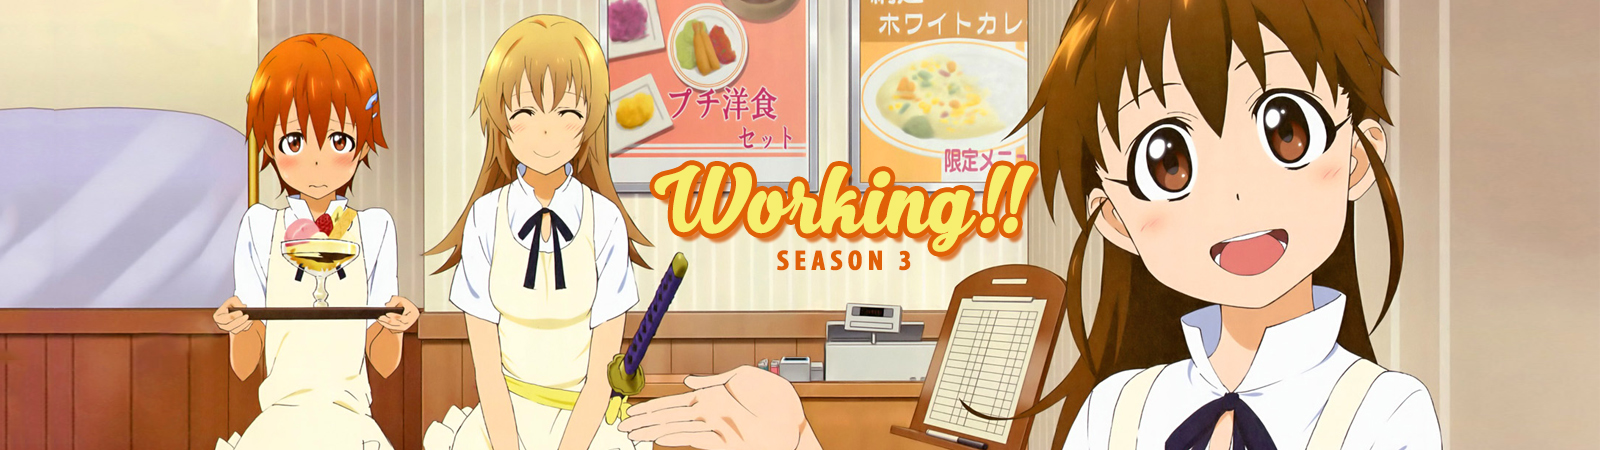 Working!! - Season 3